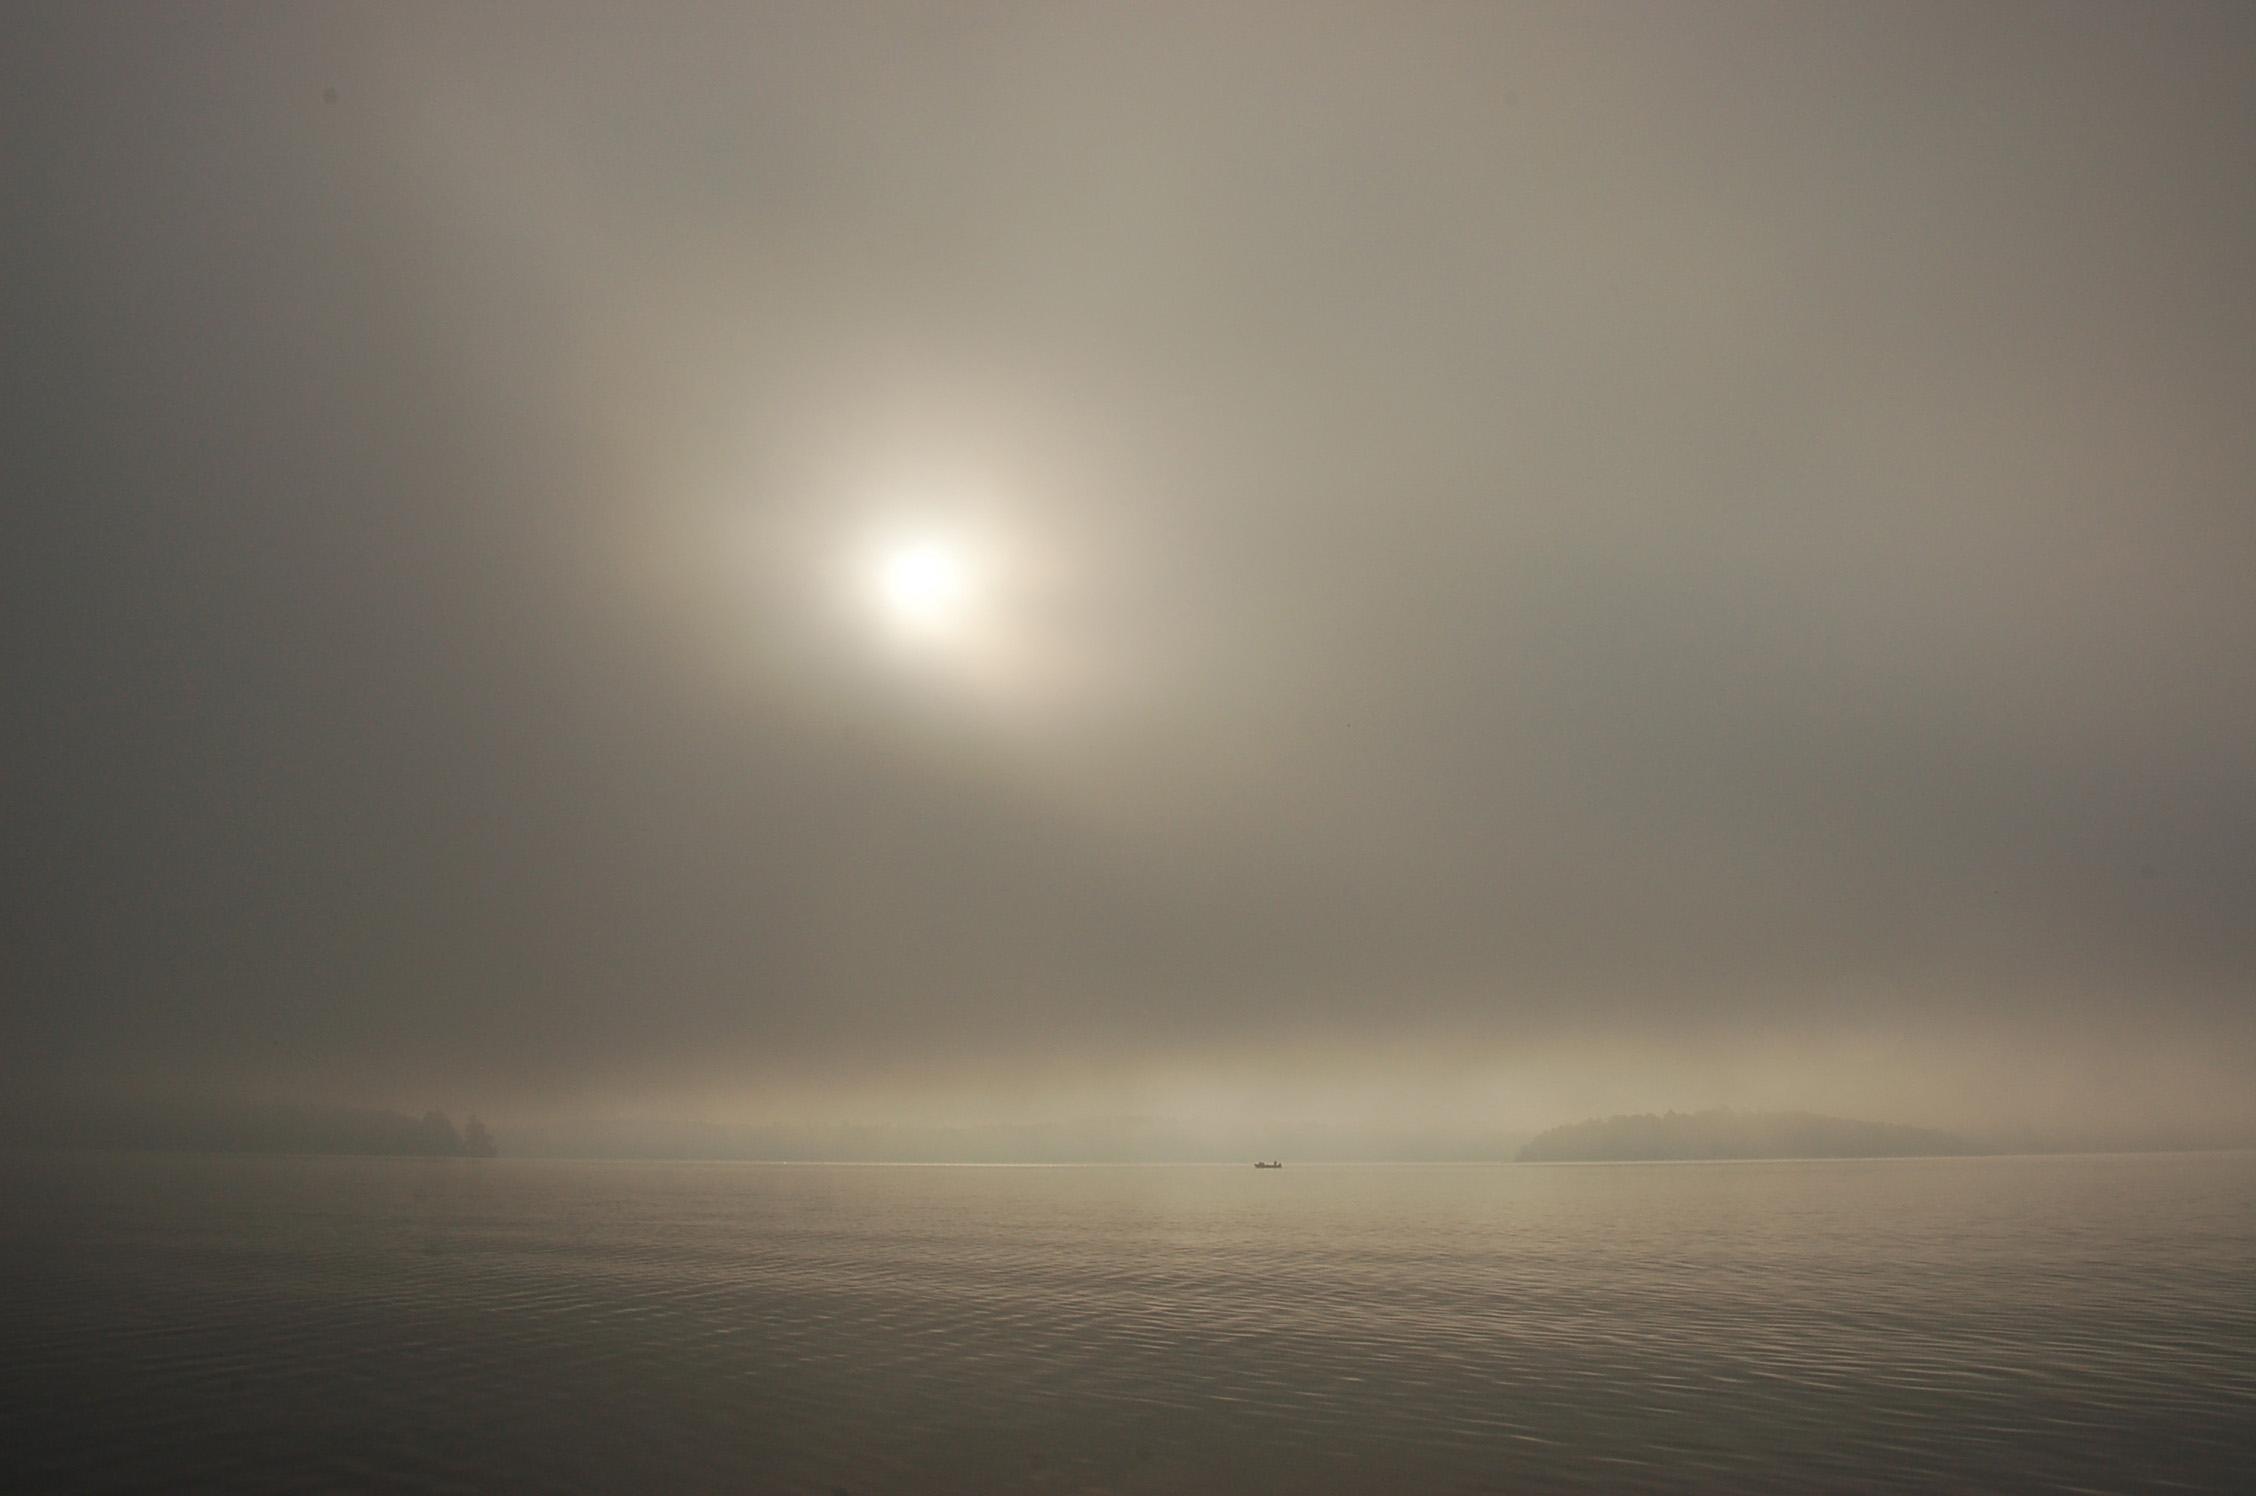 Boat in Sunrise Fog Ely 2007 copy.jpg